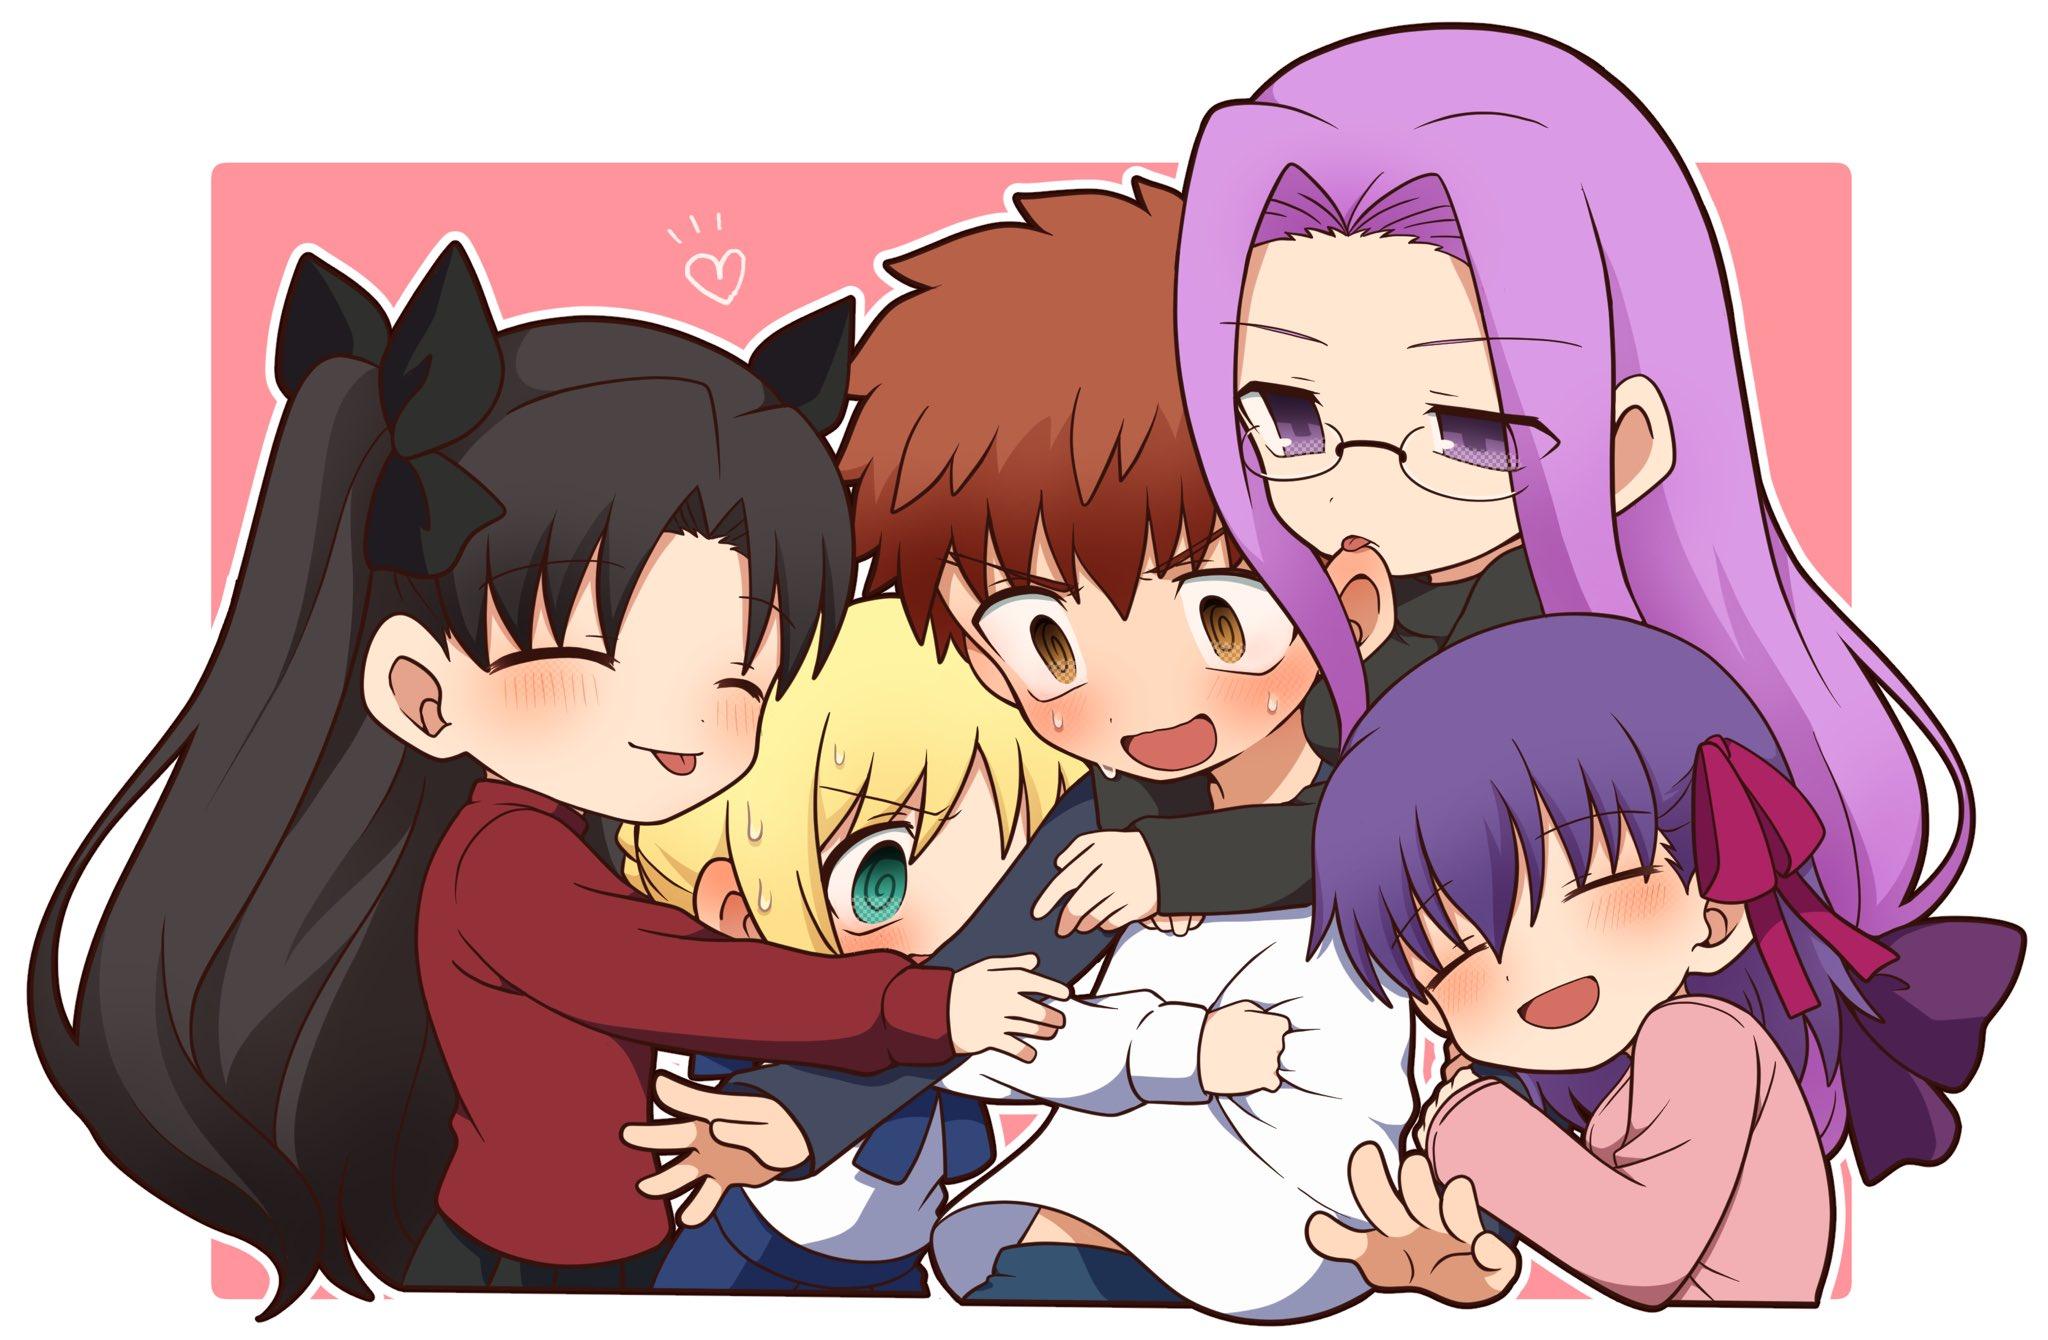 Fate Series Fate Stay Night Fate Stay Night Heavens Feel Anime Girls Anime Boys Chibi Hugging Twinta 2048x1340